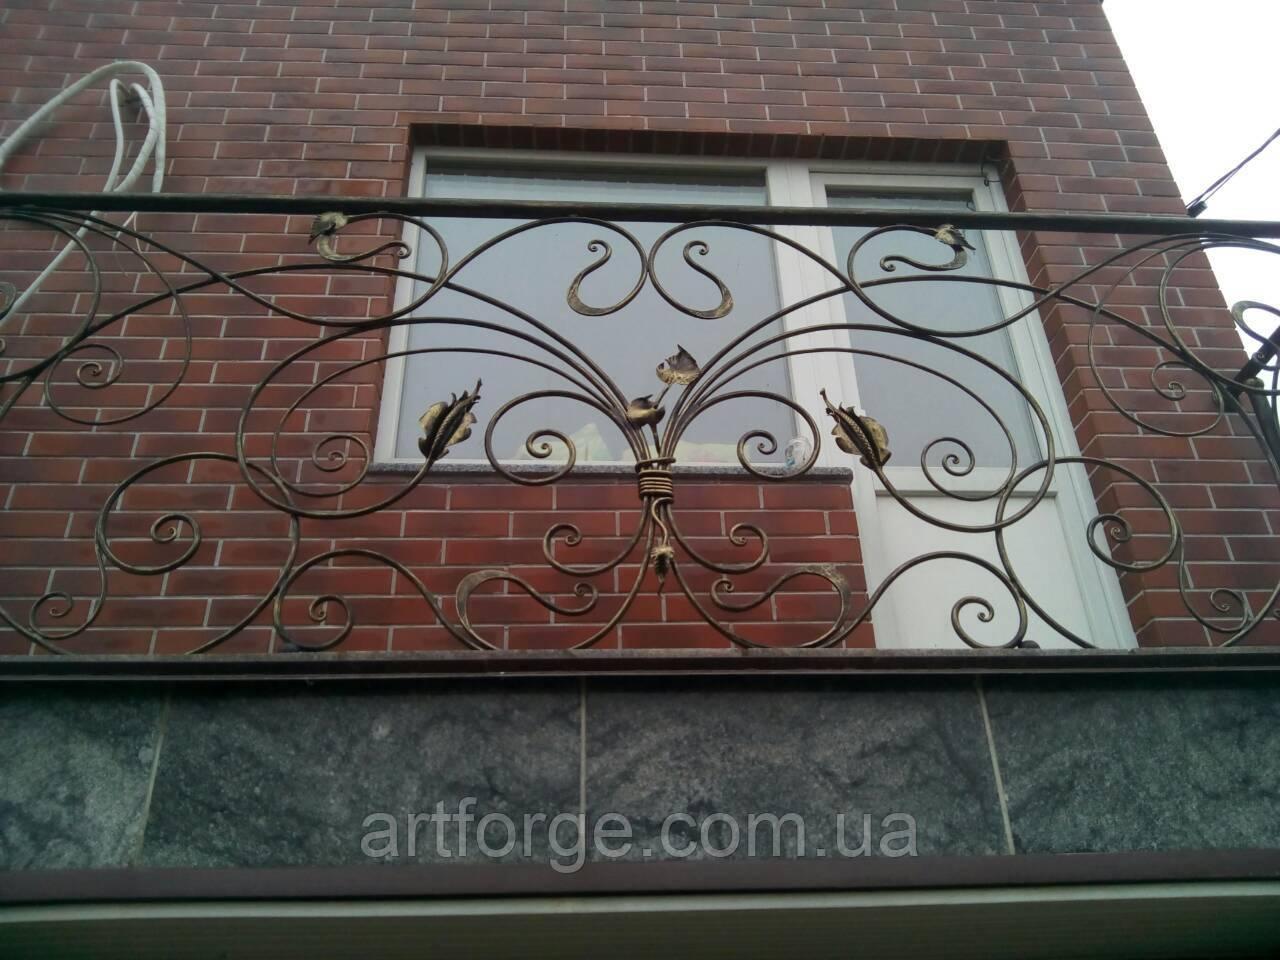 Кованый балкон в стиле модерн.